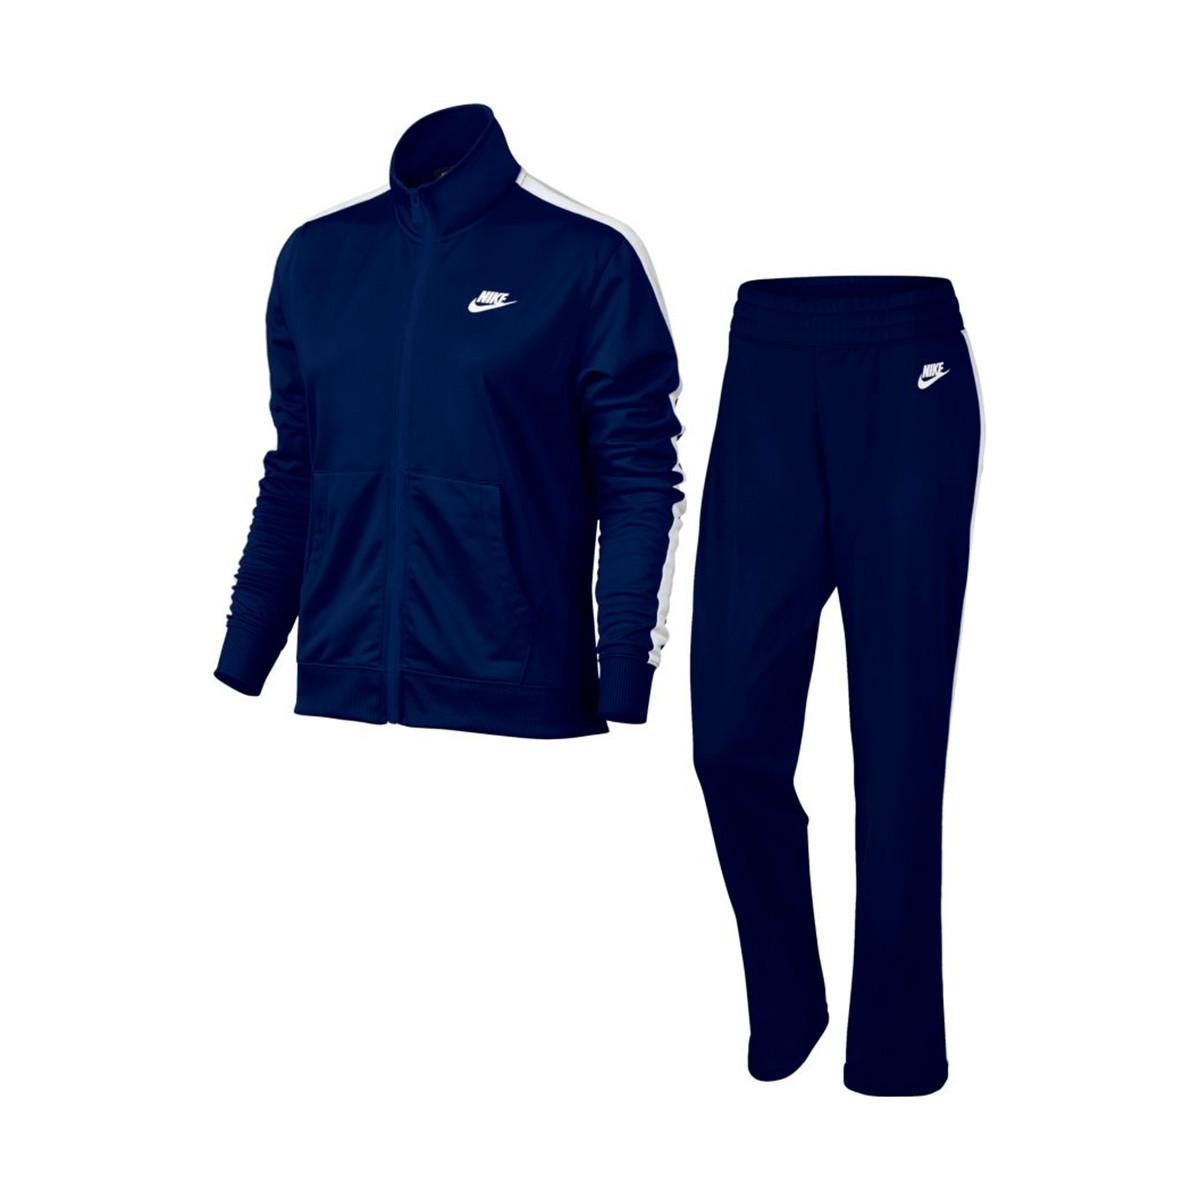 Nike Sportswear Mujer Tracksuit